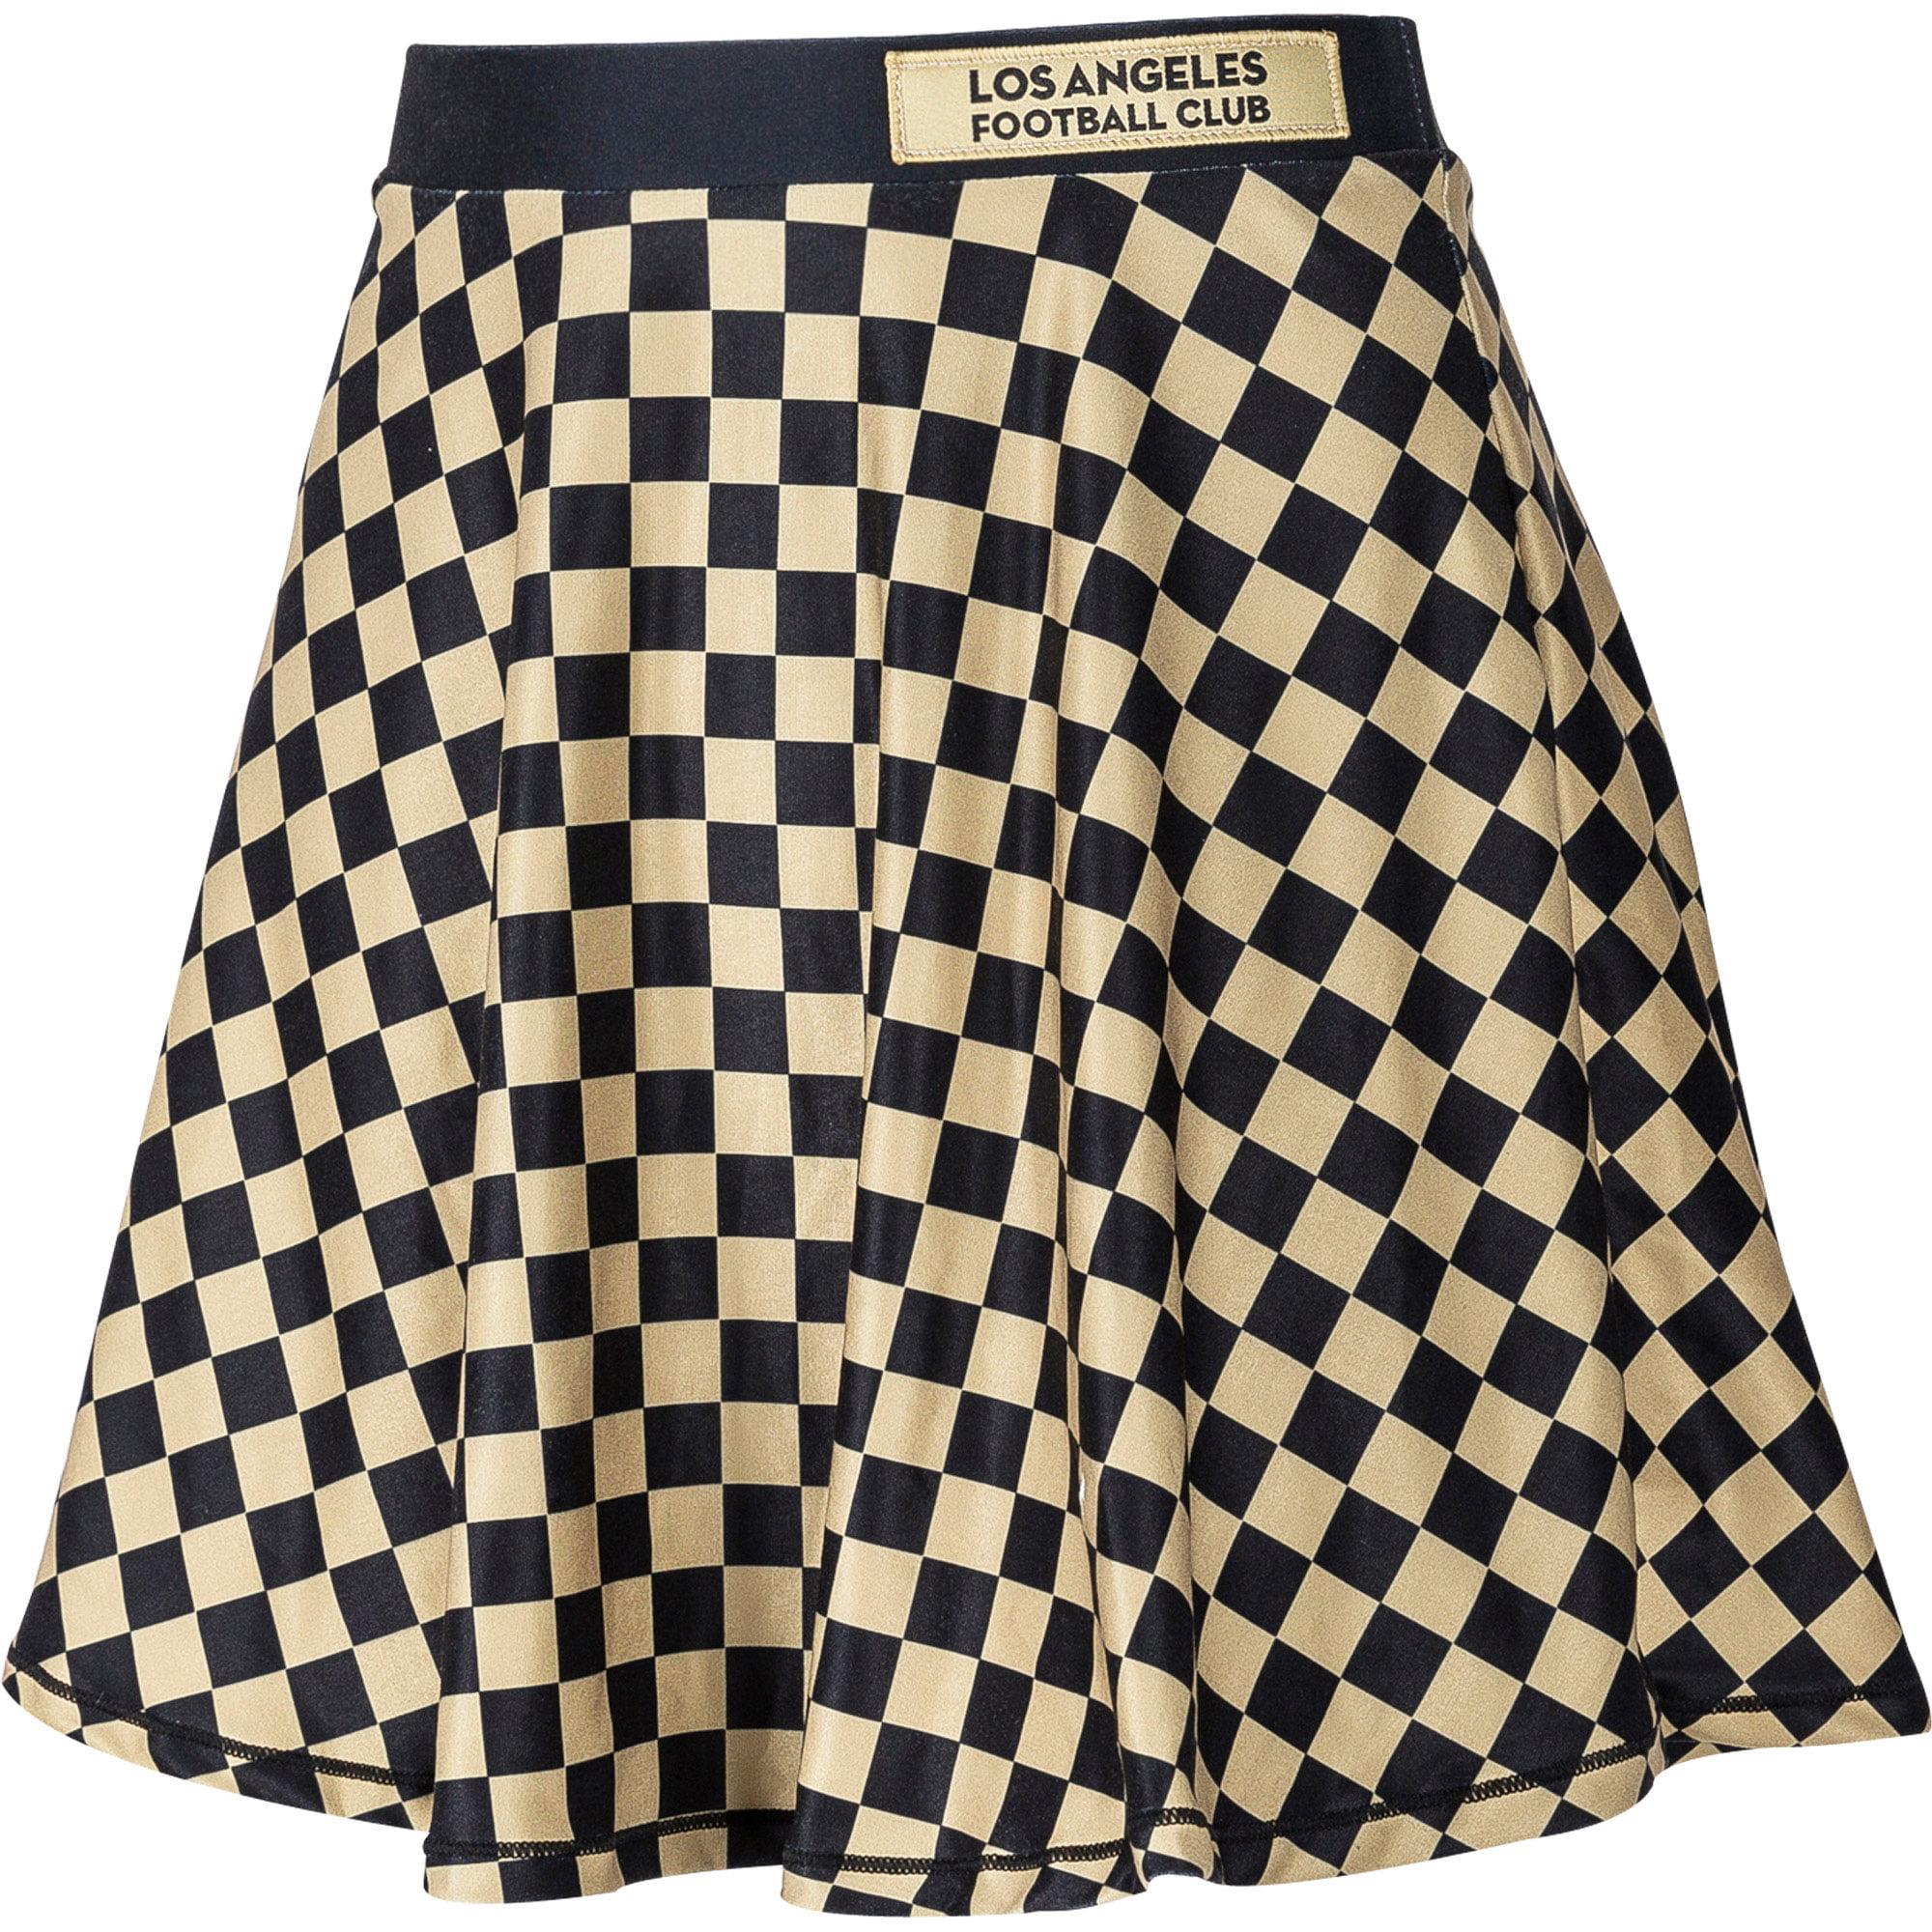 LAFC ZooZatz Women's Circle Mini Skirt - Black/Gold